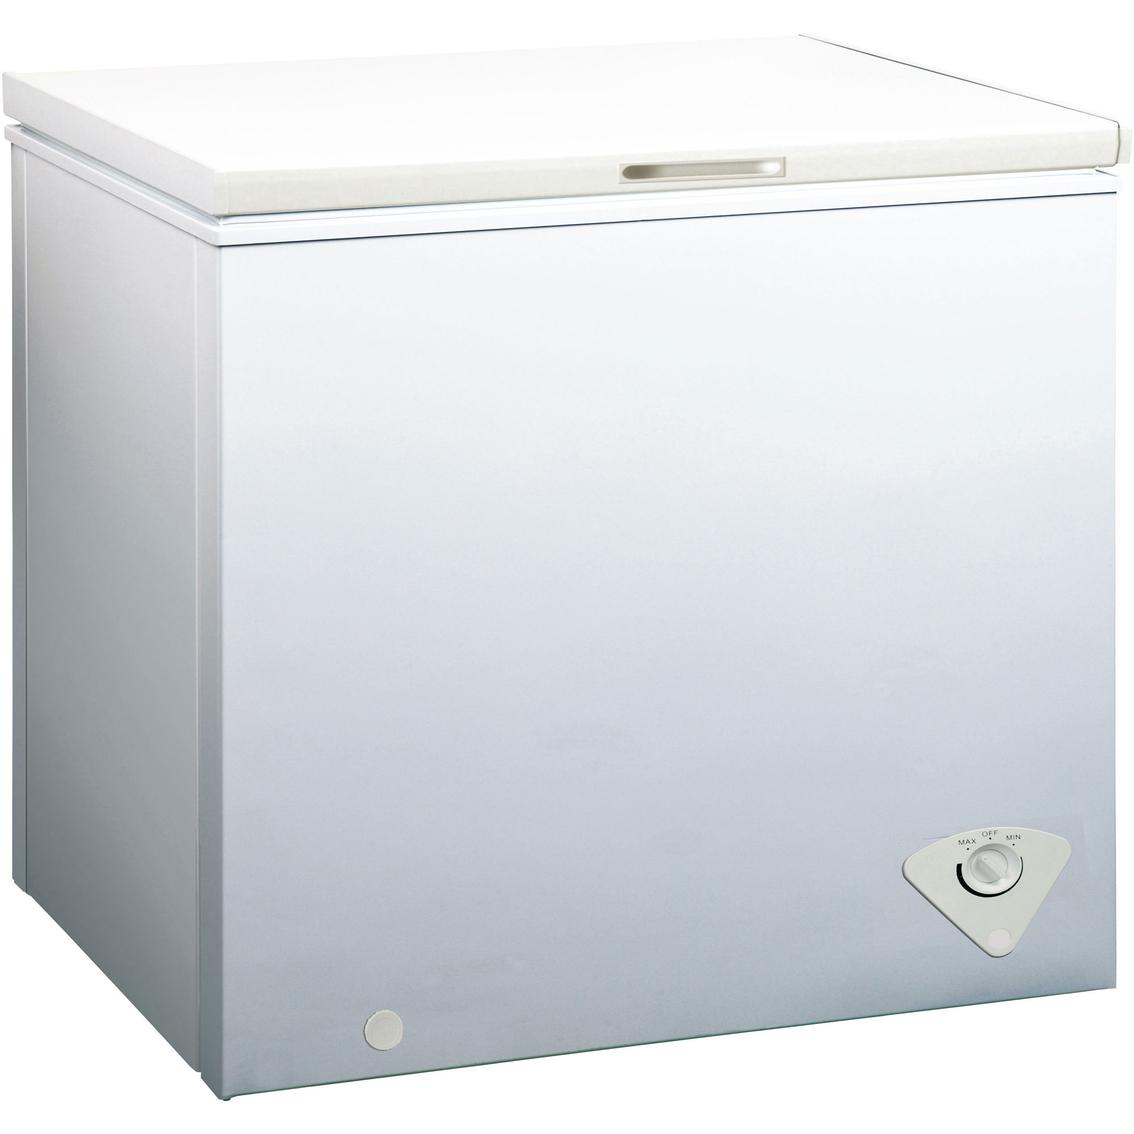 midea 7 cu ft chest freezer freezers home. Black Bedroom Furniture Sets. Home Design Ideas